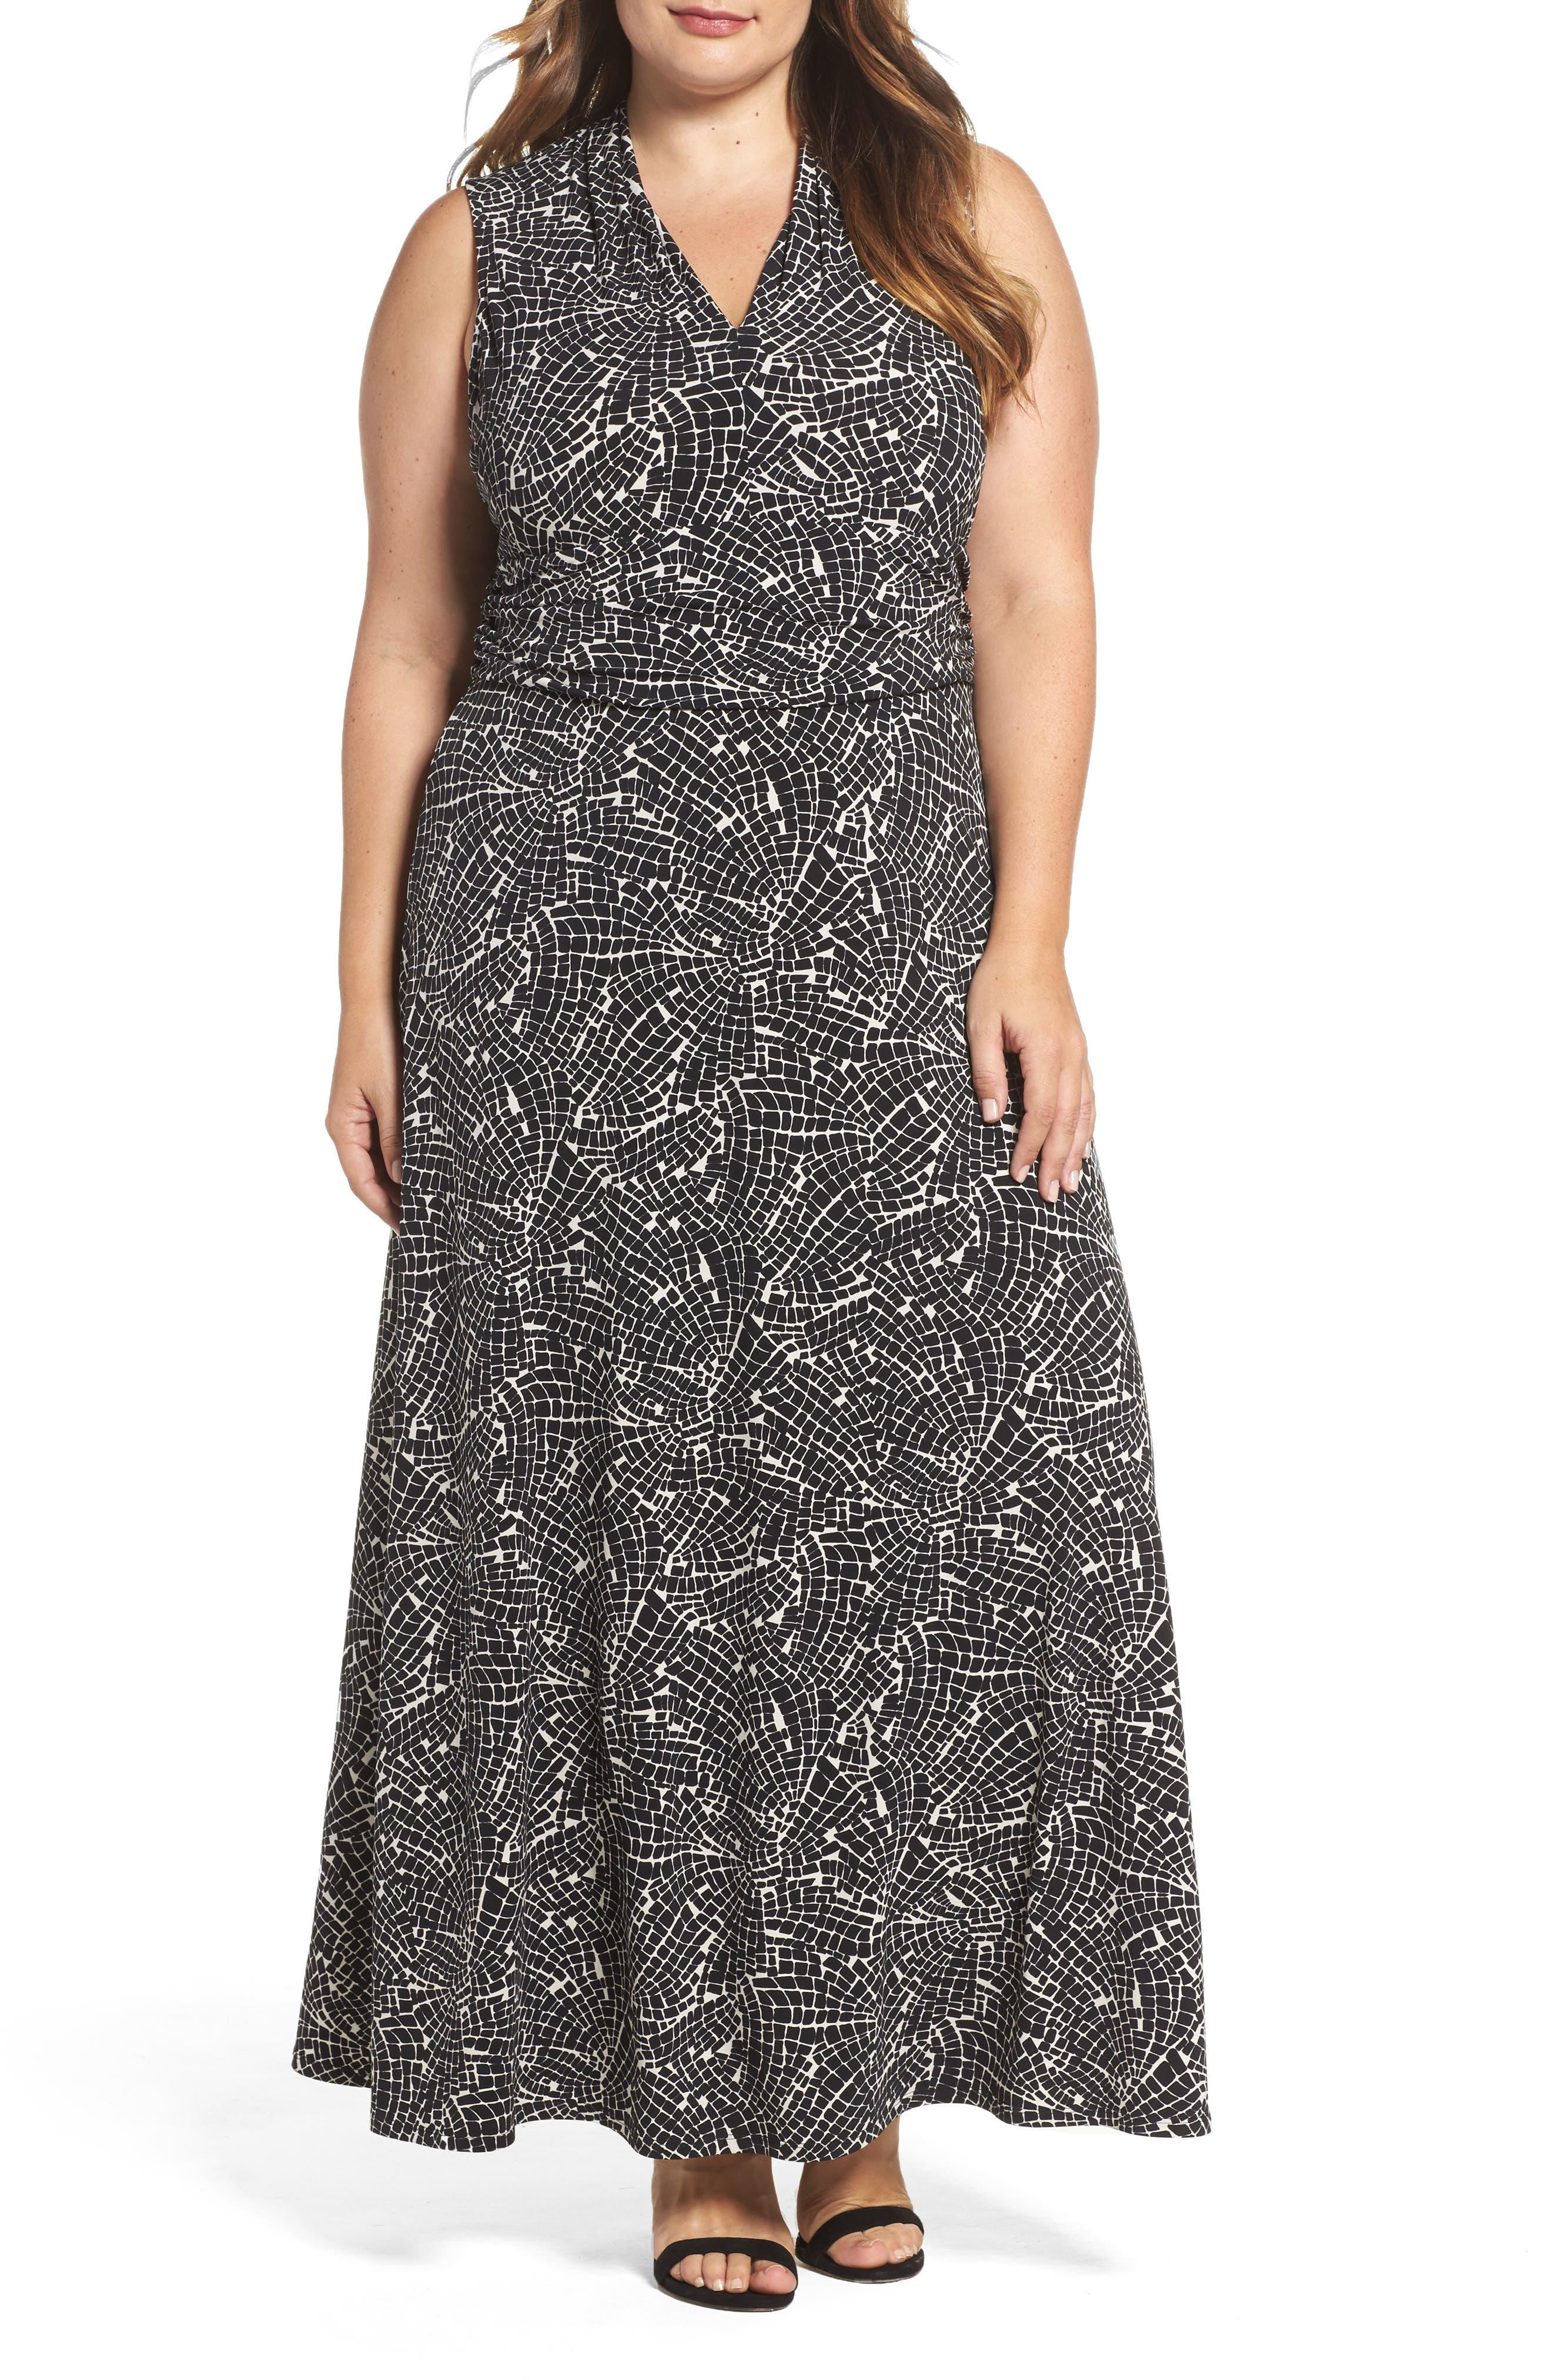 VINCE CAMUTO Modern Mosaic Maxi Dress